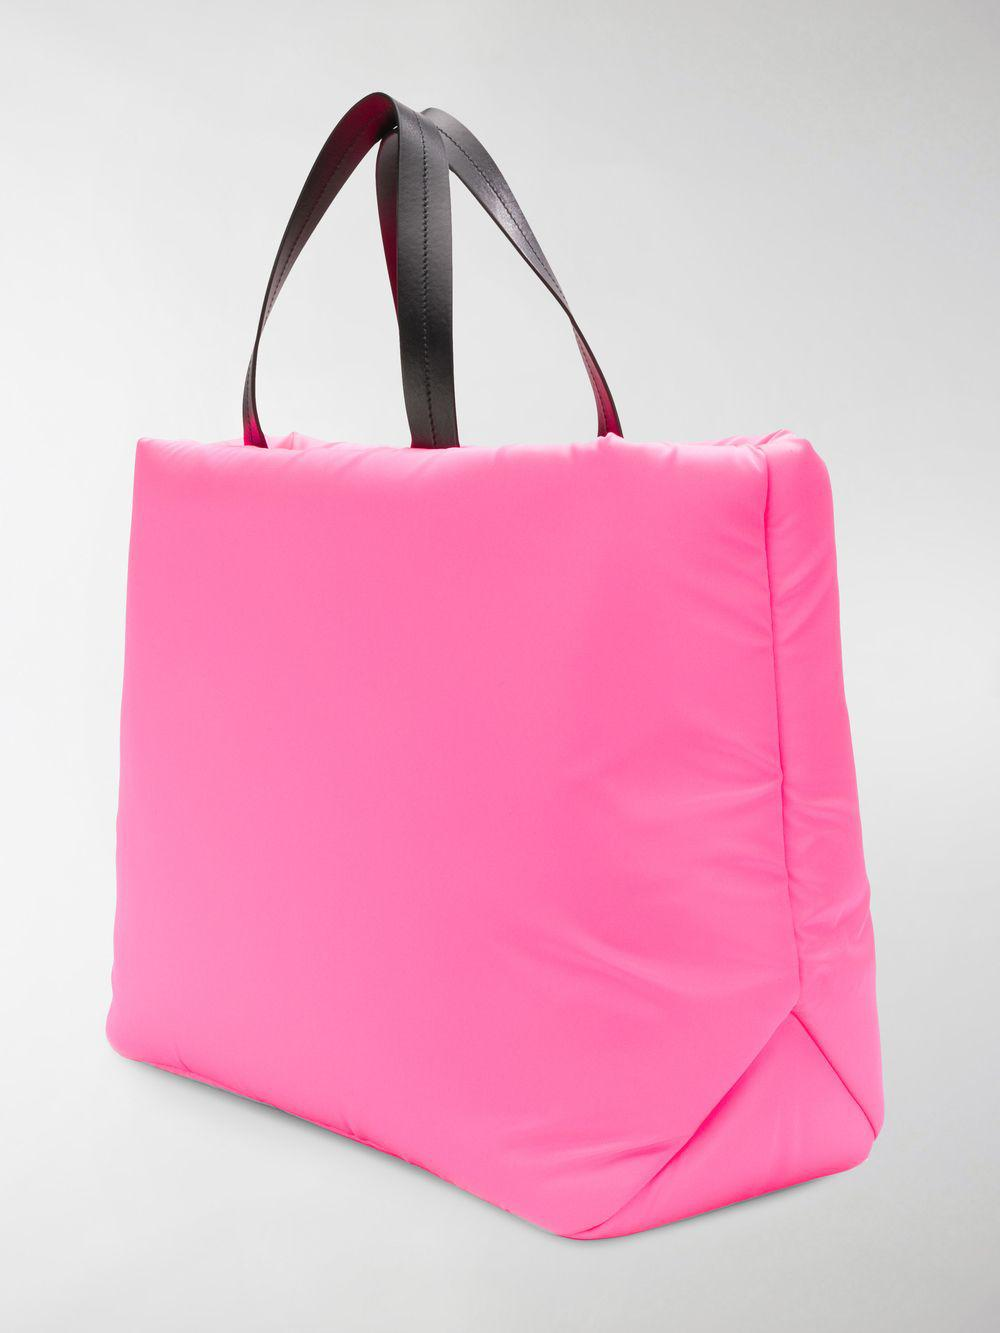 d6f2cf32303f Lyst - Prada Medium Padded Nylon Tote in Pink